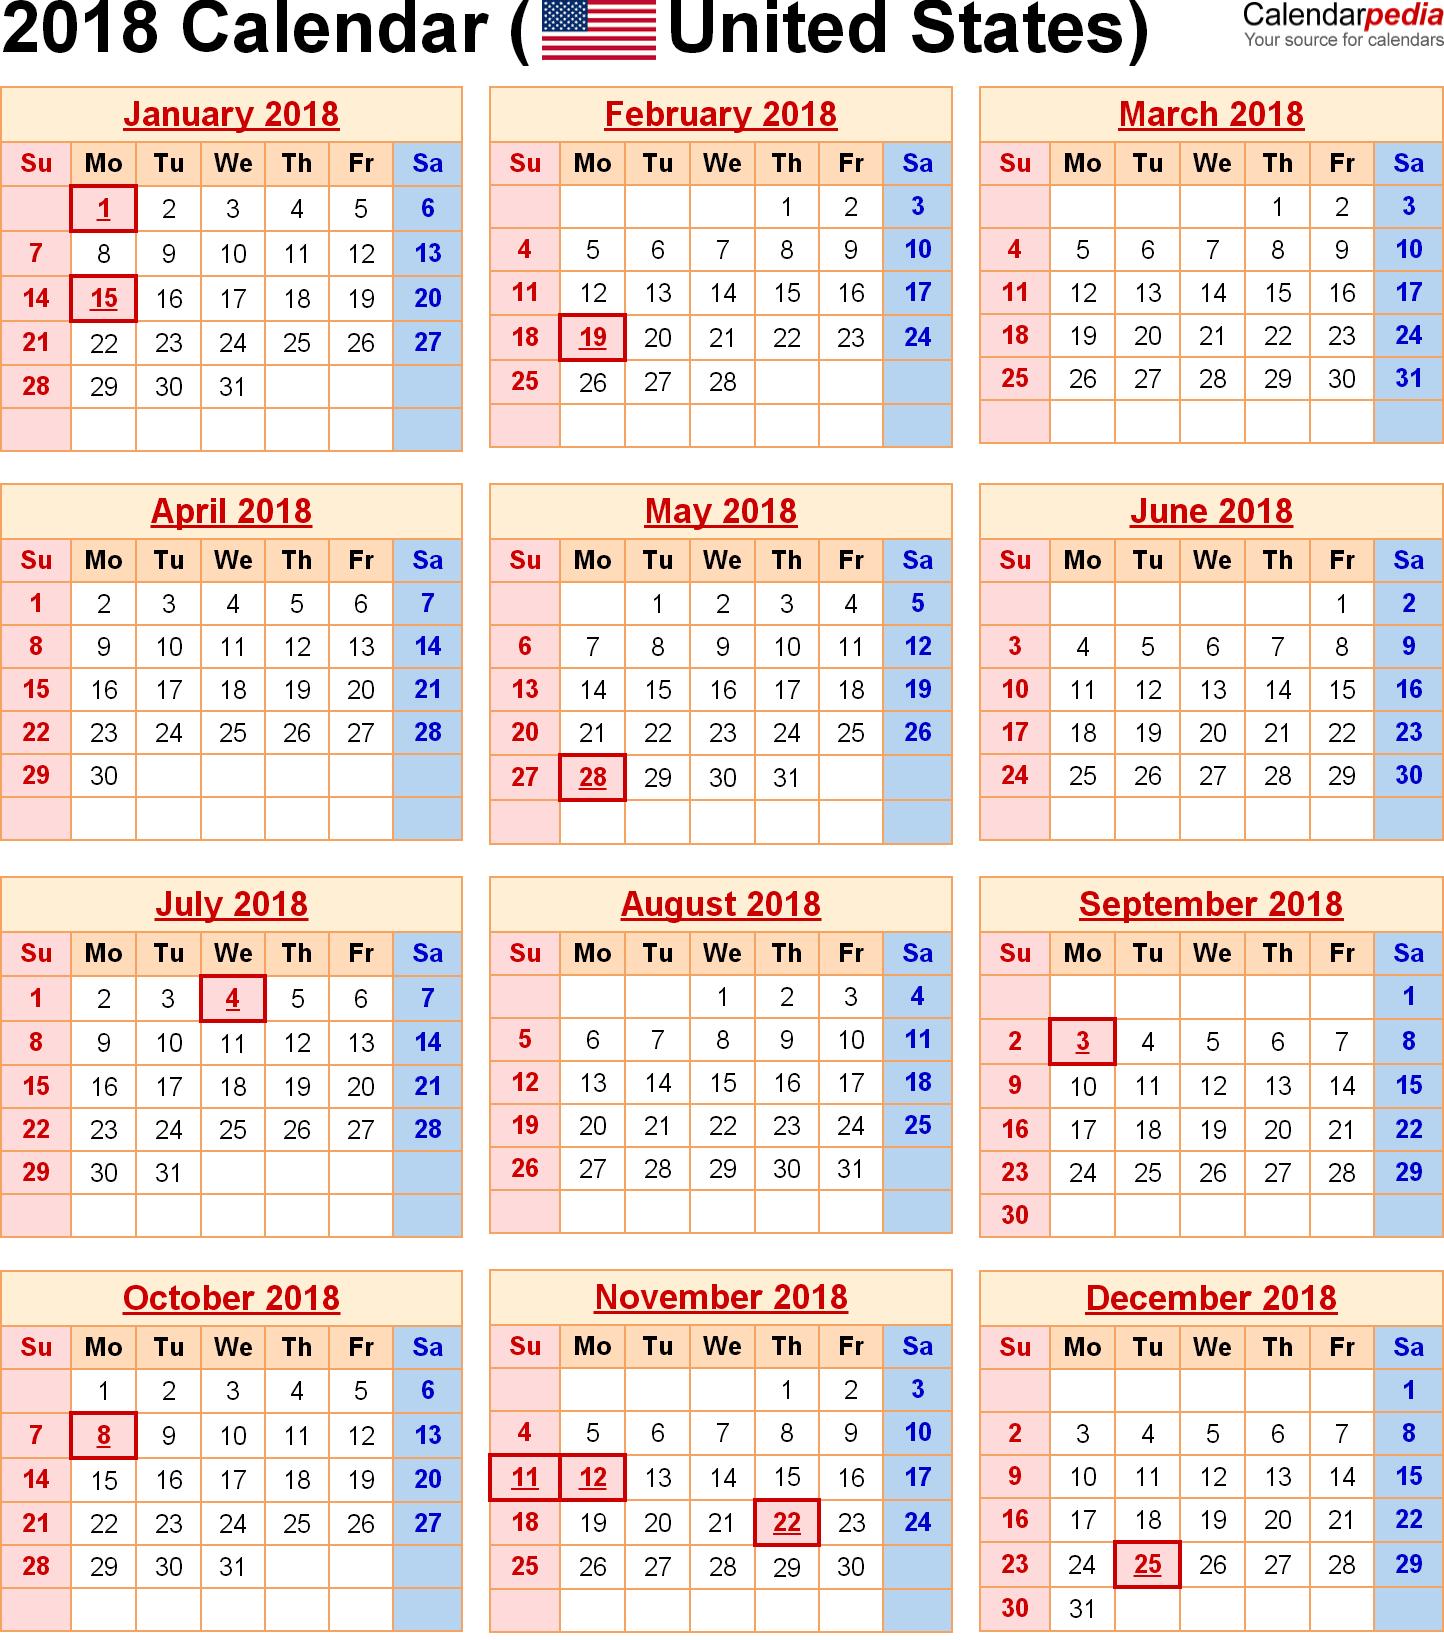 2018 Calendar United States Holidays | Holiday Calendar